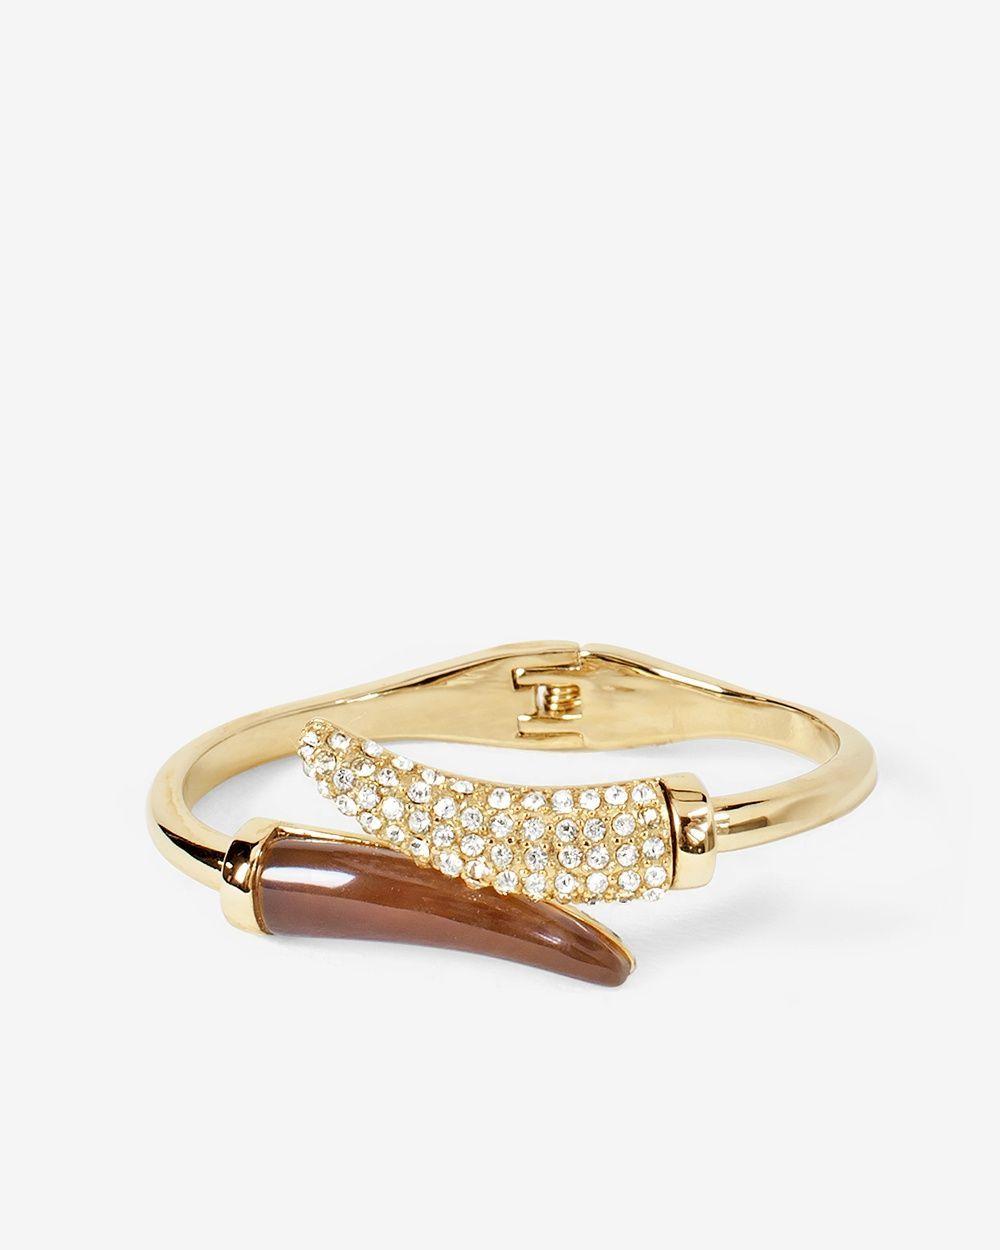 Double-Horn Cuff Bracelet